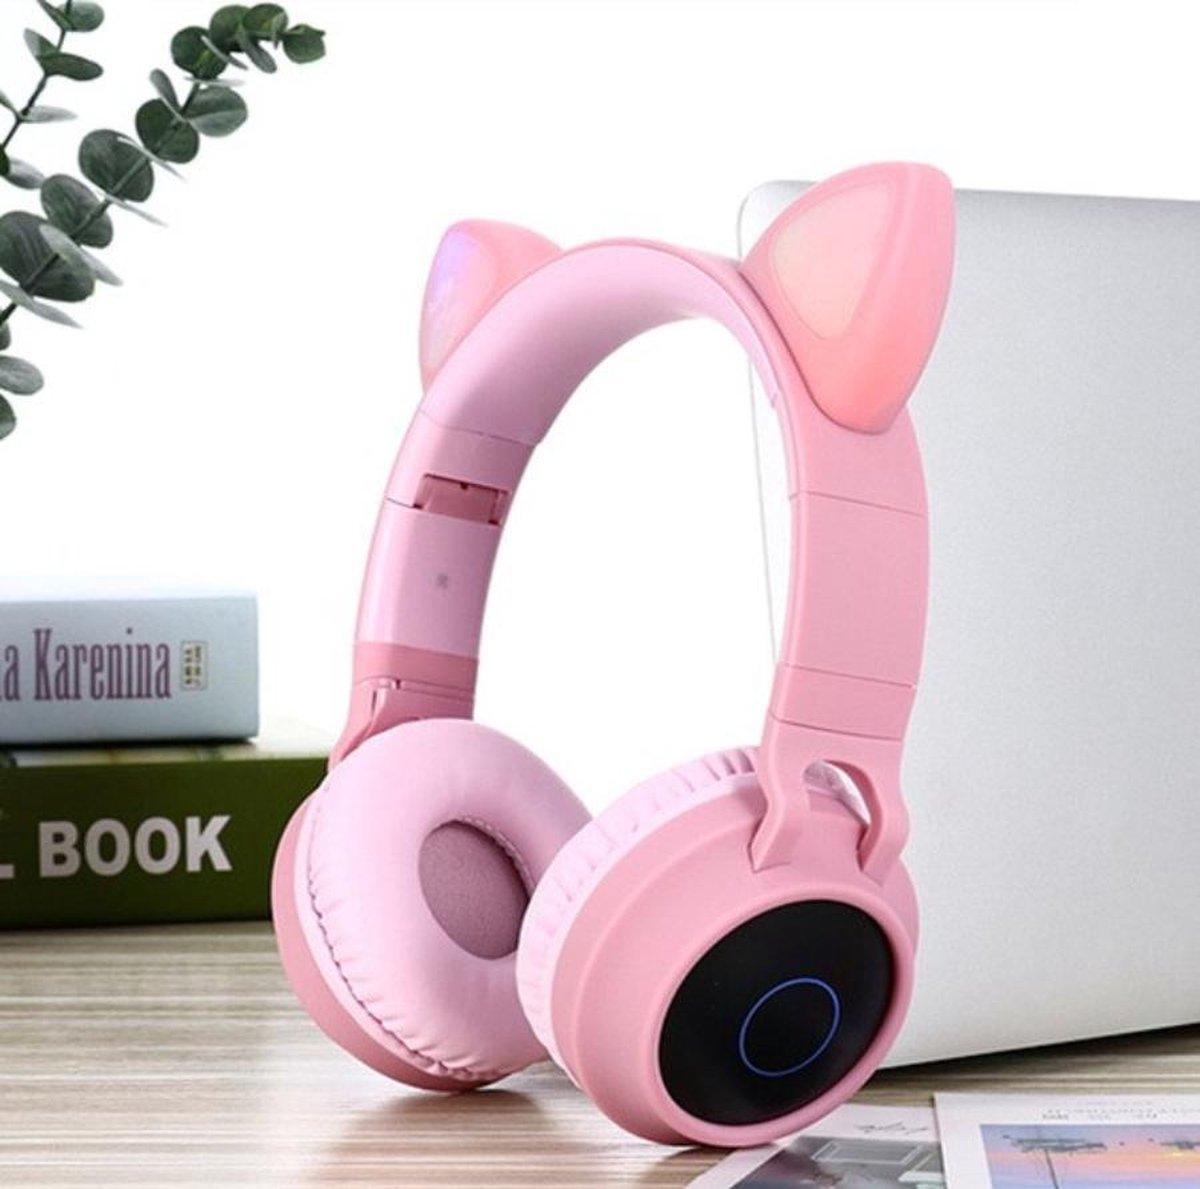 WiseGoods – Koptelefoon Kattenoortjes – Noise Canceling Hoofdtelefoon – Draadloos On Ear – Bluetooth V5.0 – Kinderen – Roze